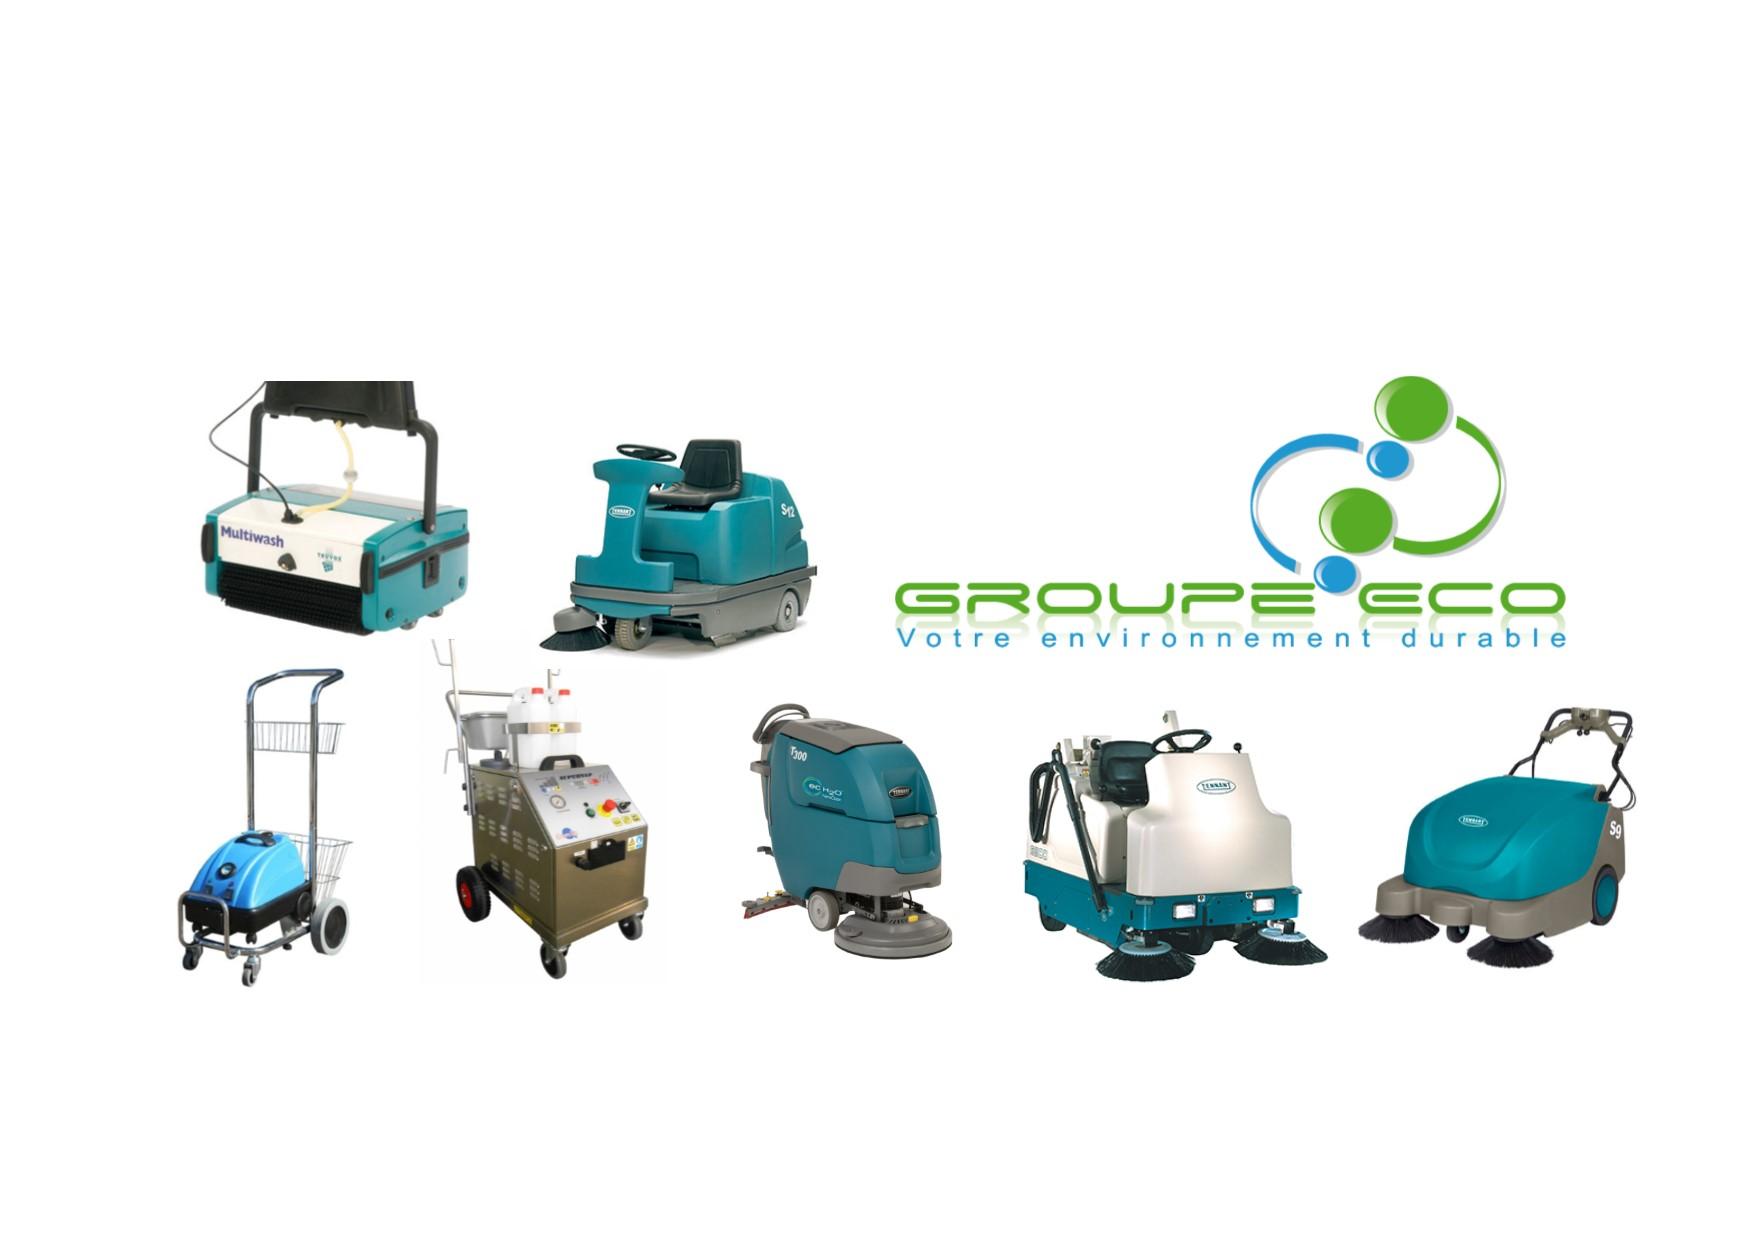 Groupe Eco